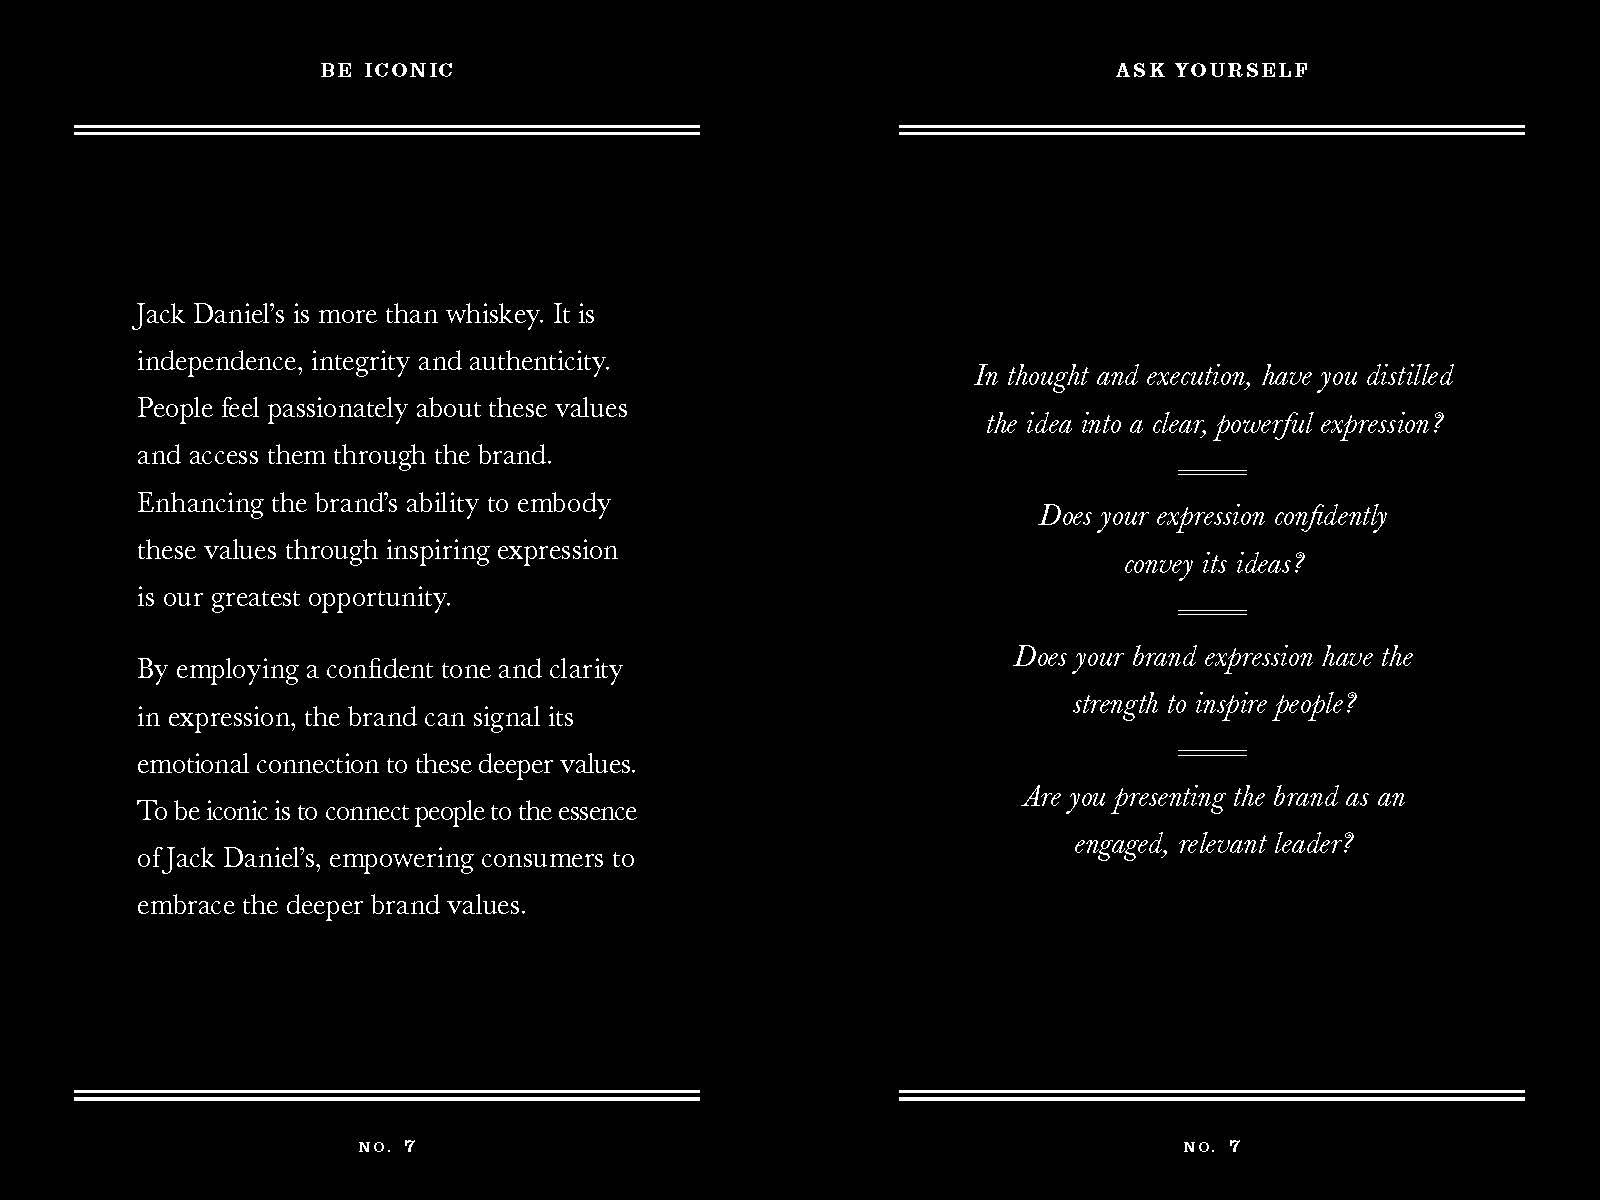 Jack Daniel's Guiding Principles 2012_Page_59.jpg